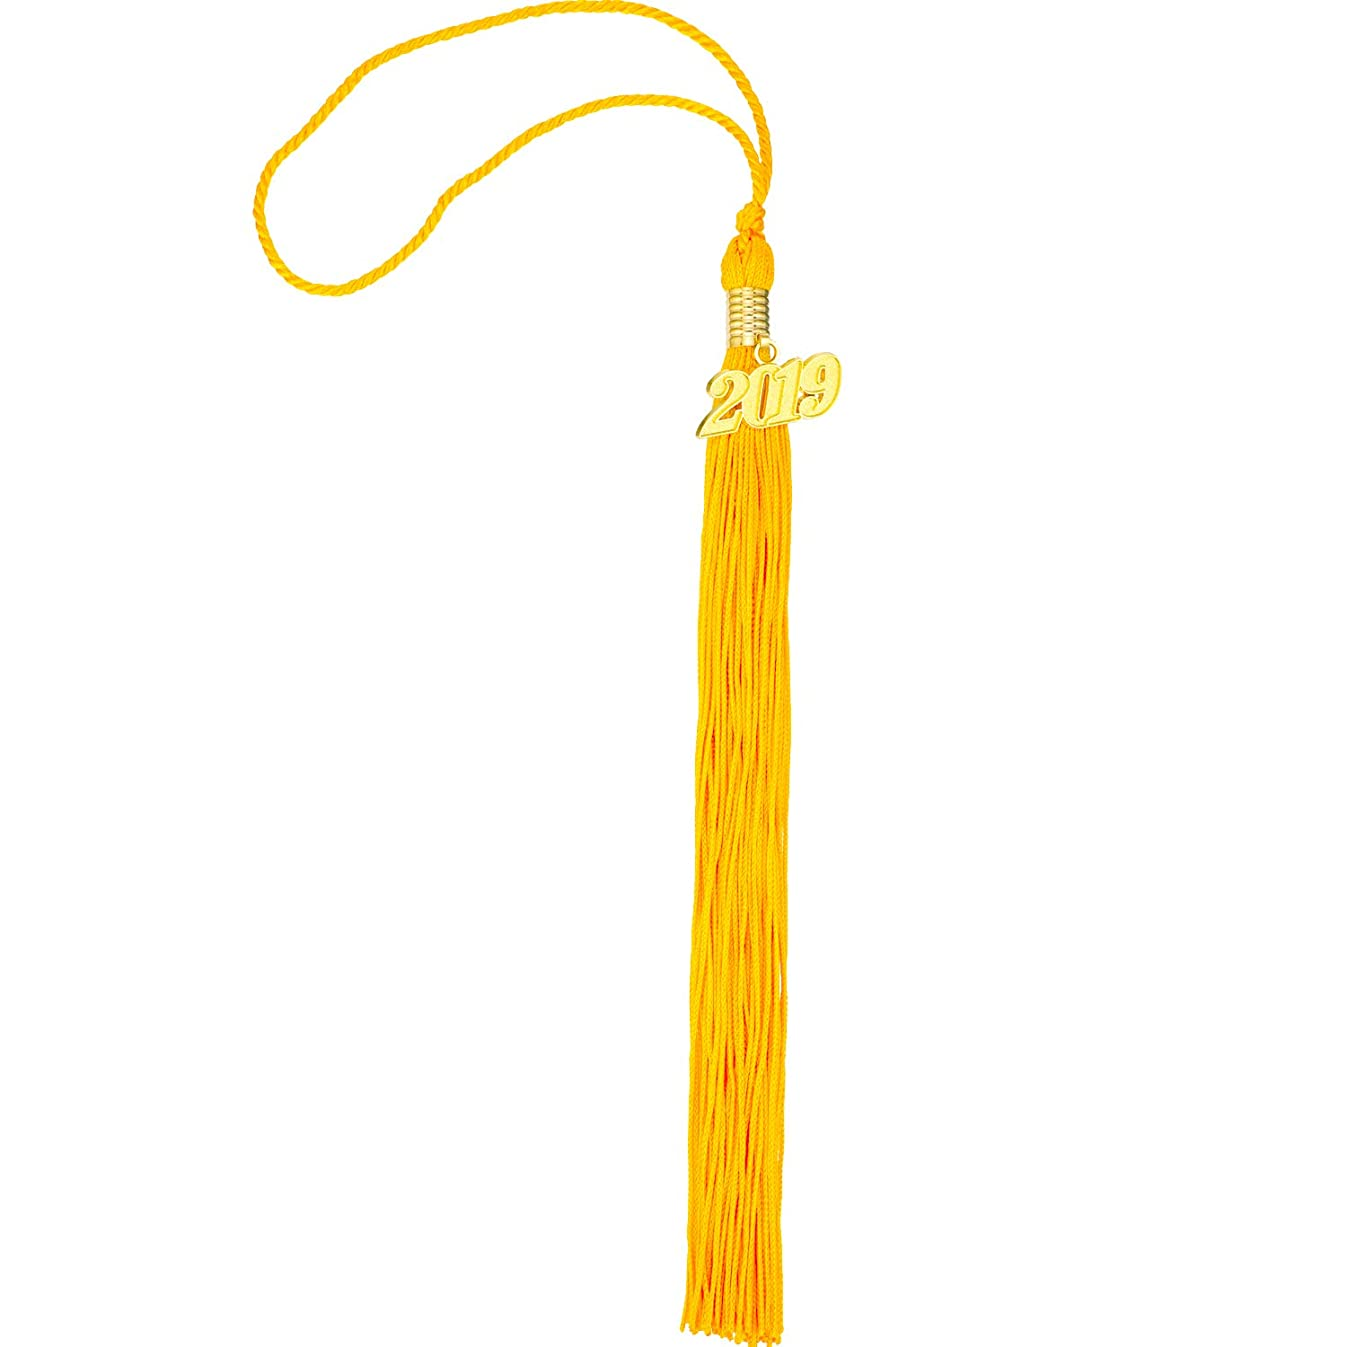 TecUnite Graduation Tassel Academic Graduation Tassel with 2019 Year Charm Ceremonies Accessories for Graduates (Gold)